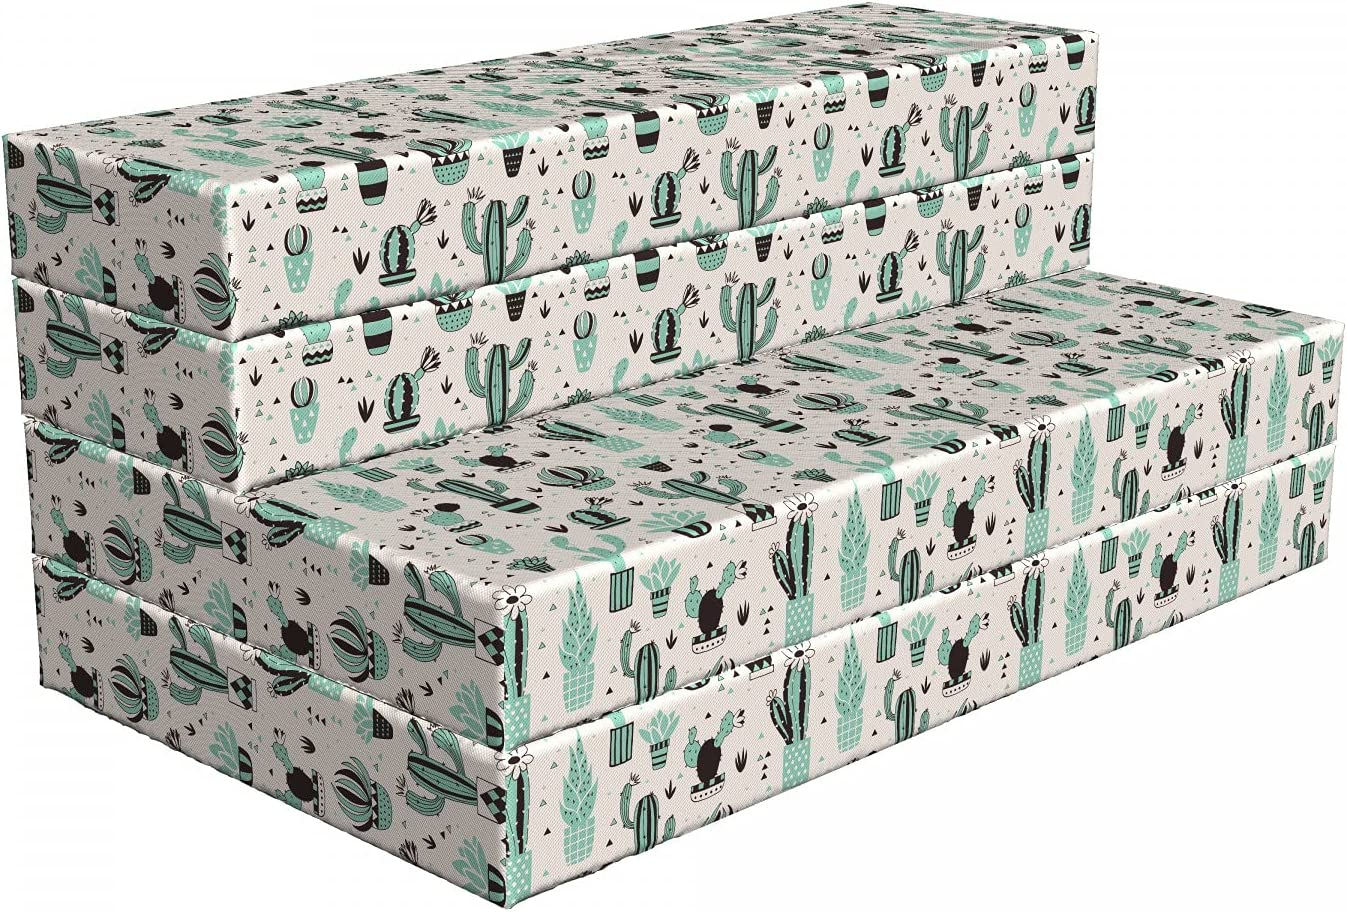 Ambesonne Cactus Foldable Mattress Geometric 78. Cartoon Topics on New popularity TV Plant